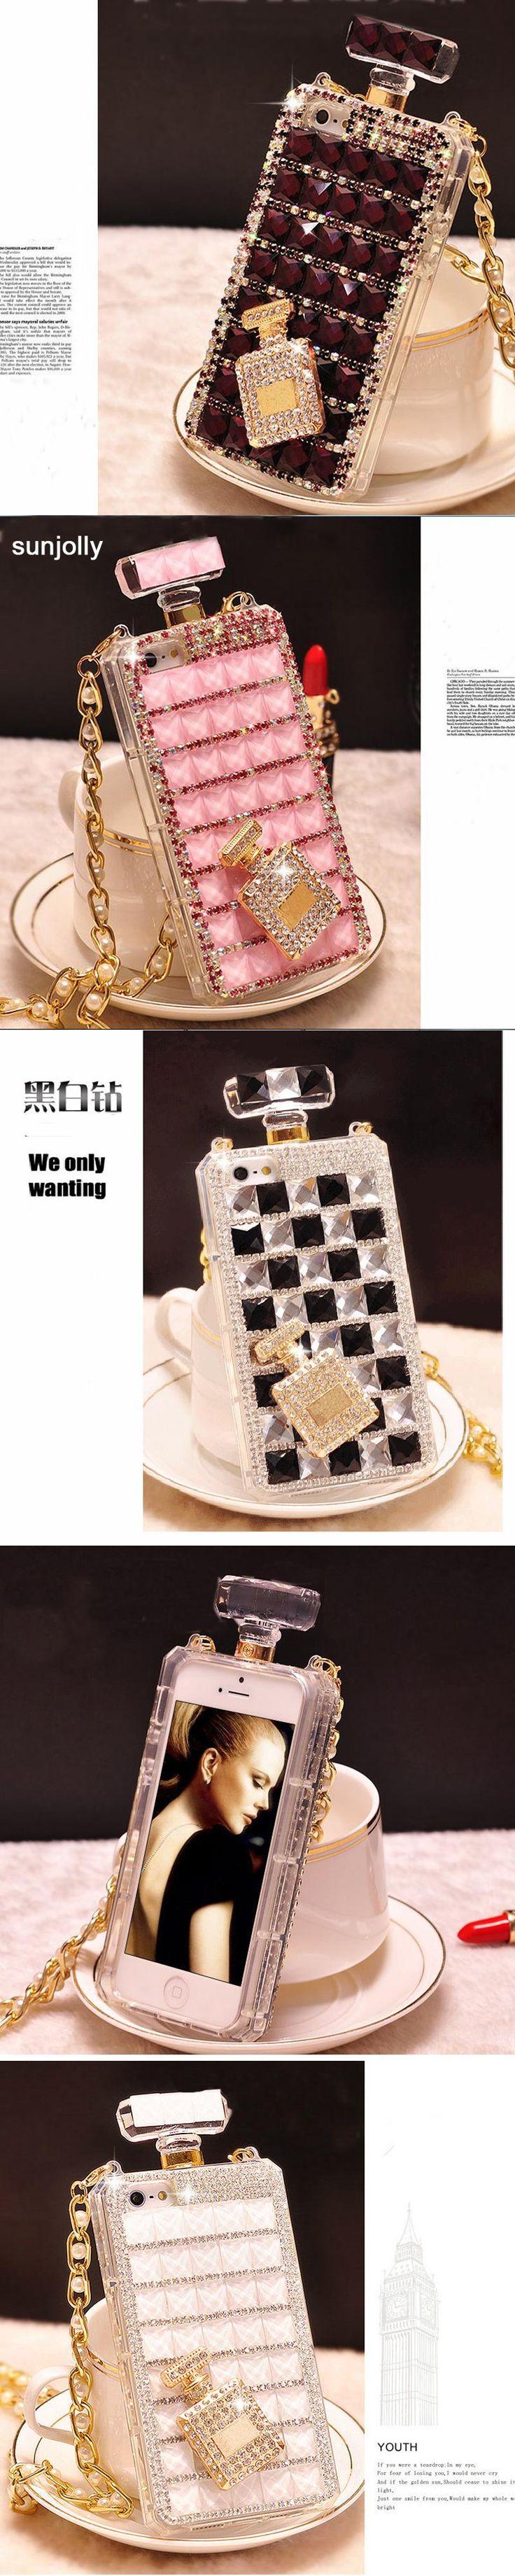 Sunjolly Chain Diamond Case TPU Rhinestone Bling Cover Diamante Funda Coque Capa Para for iPhone X 8 7 6s/6 Plus 5S 5 5C SE 4S